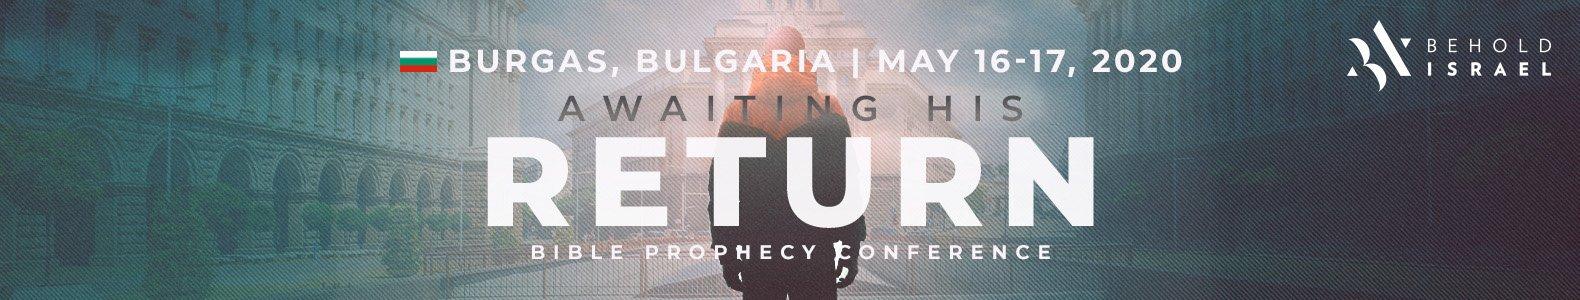 Awaiting His Return Conference 2020 Bulgaria